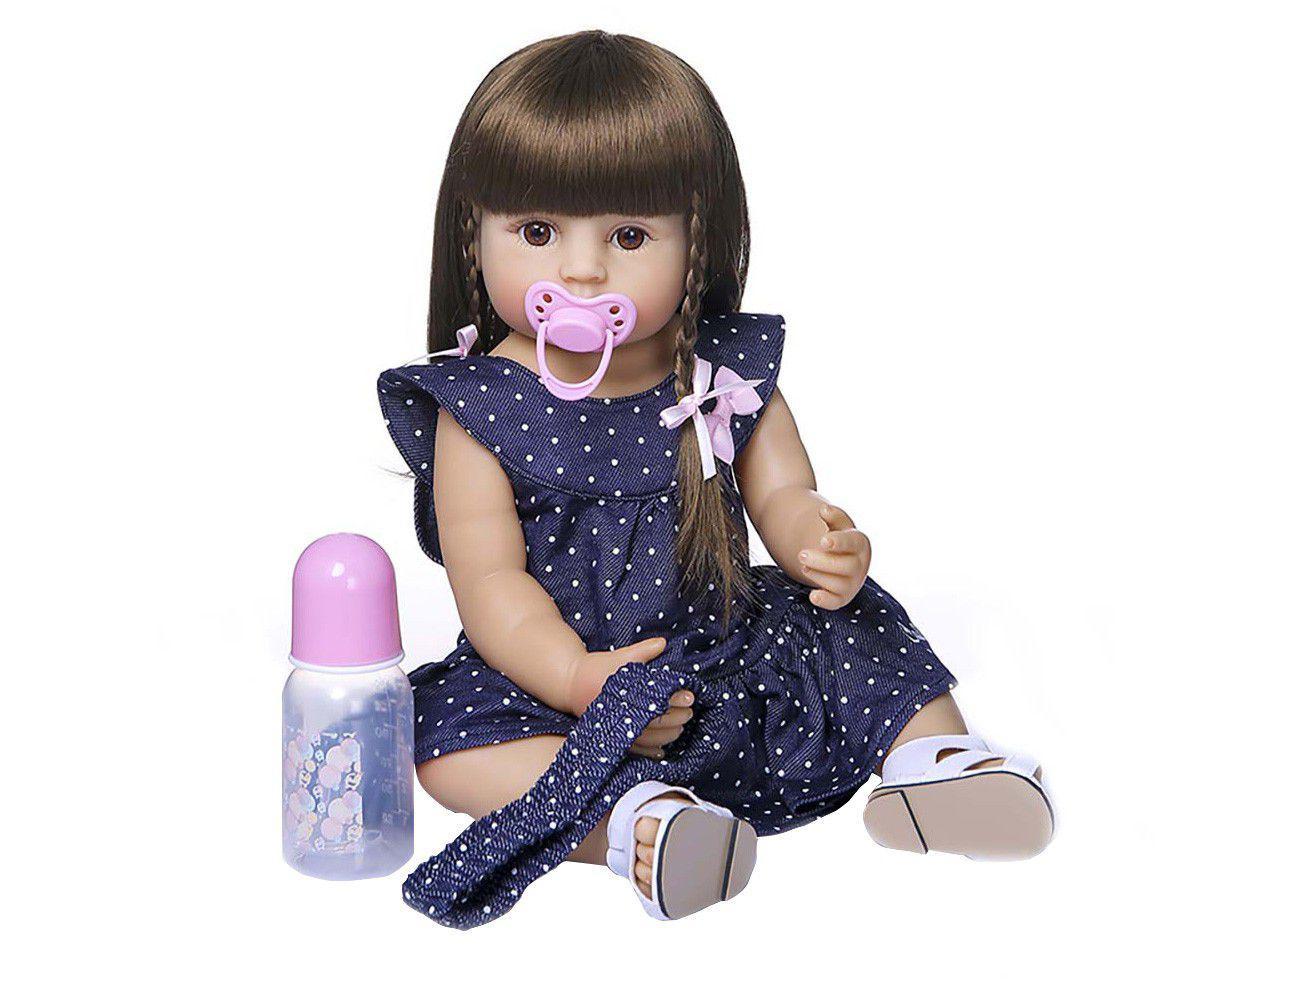 Bebê Reborn Princess Laura Baby 45cm - com Acessórios